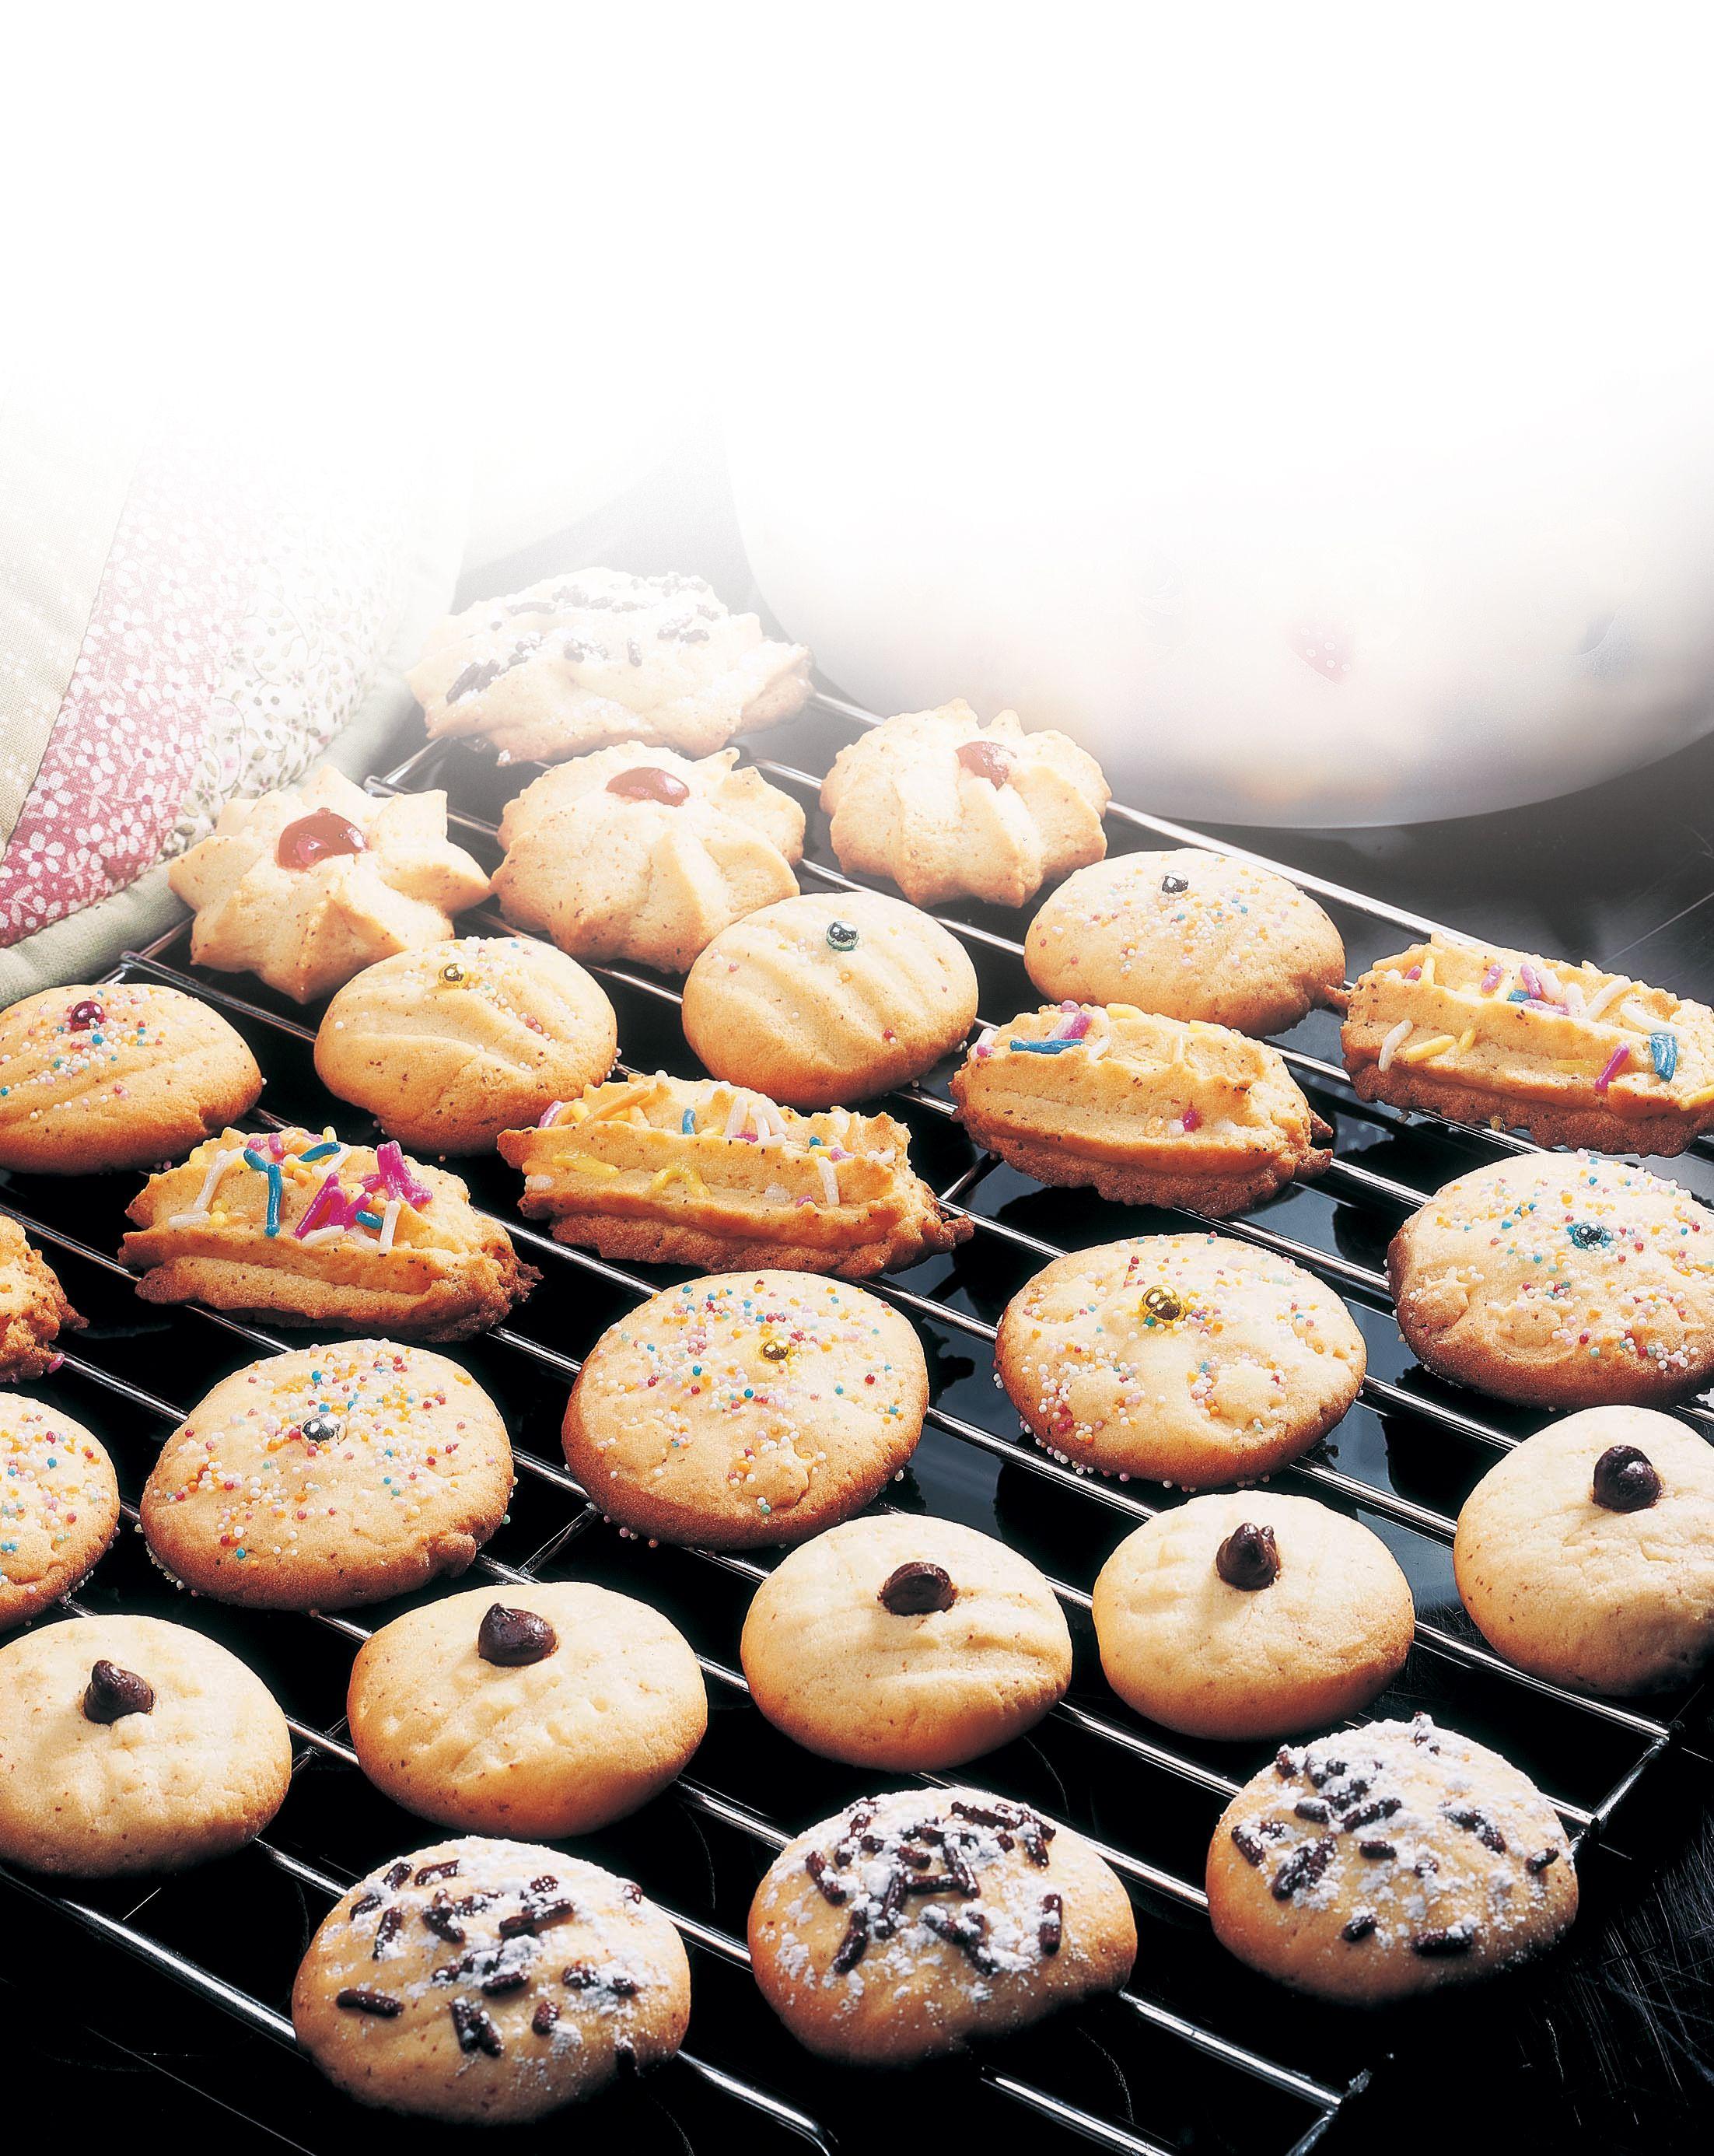 Mamma's Biscuits